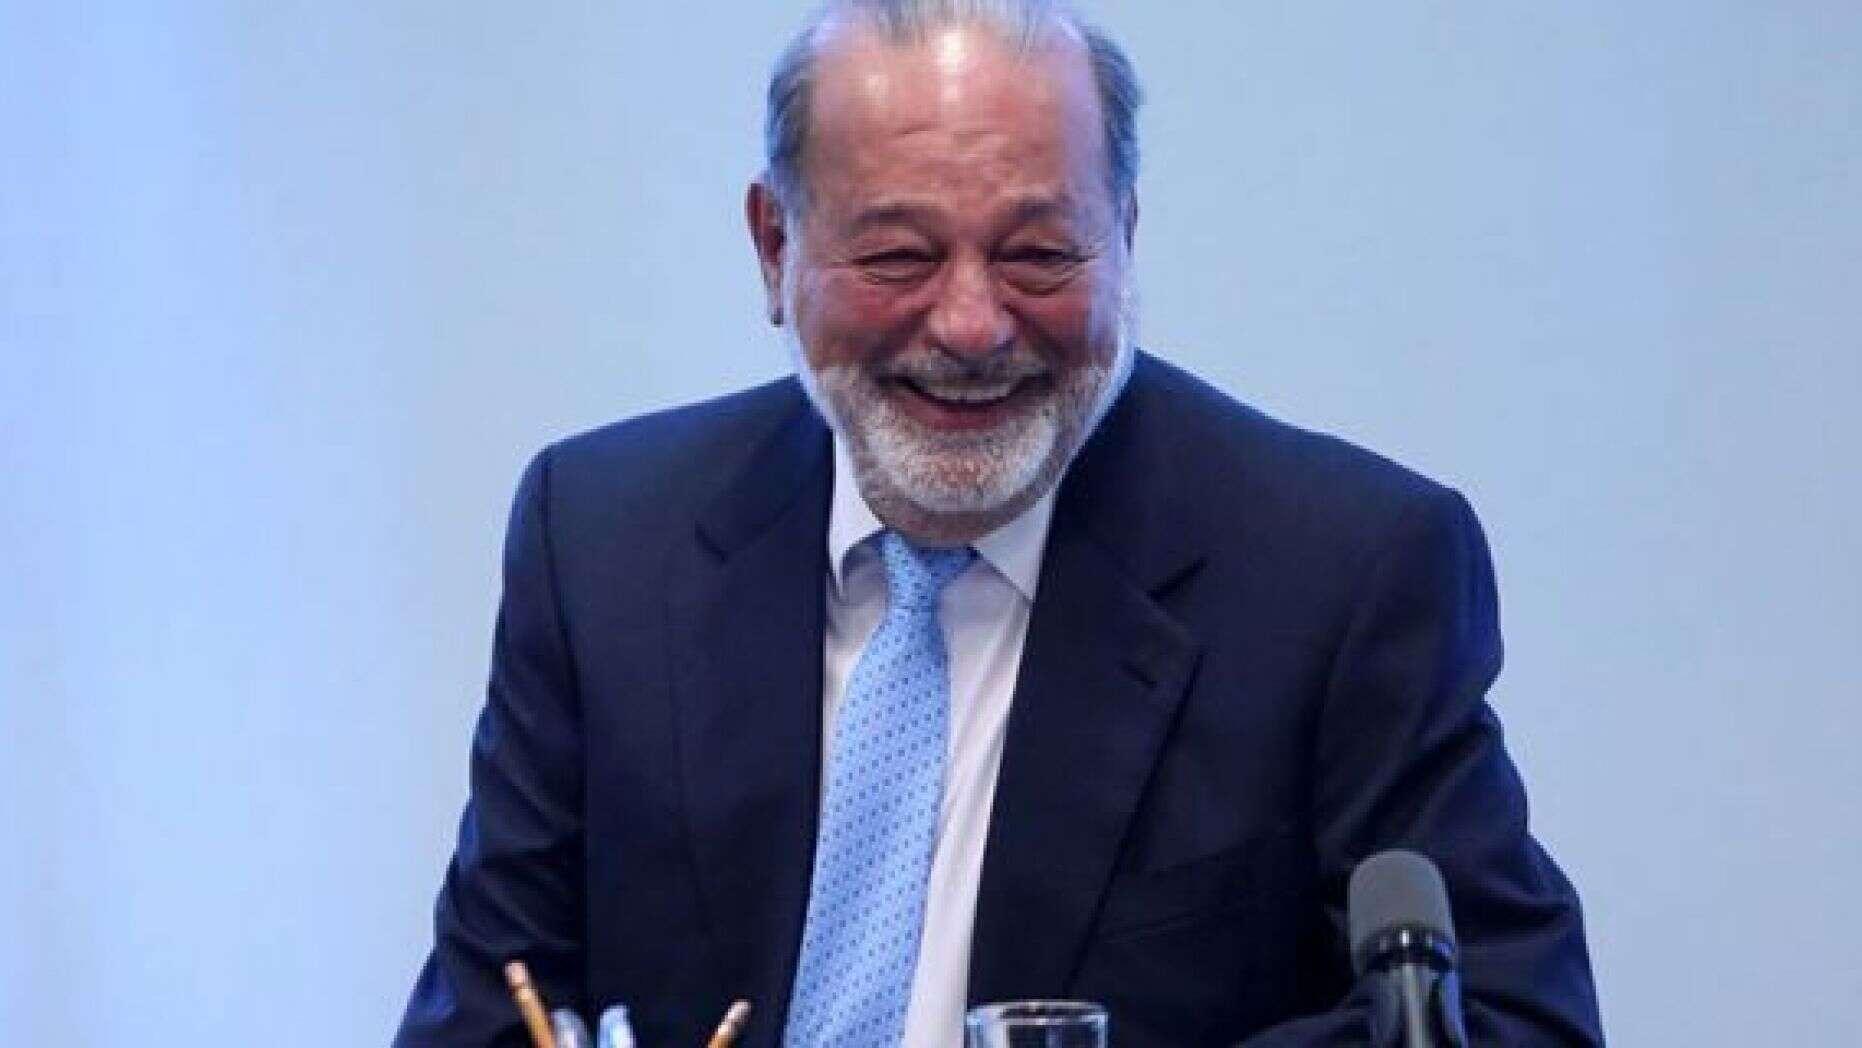 Carlos Slim Mexican Business Magnate, Engineer, Investor, Philanthropist